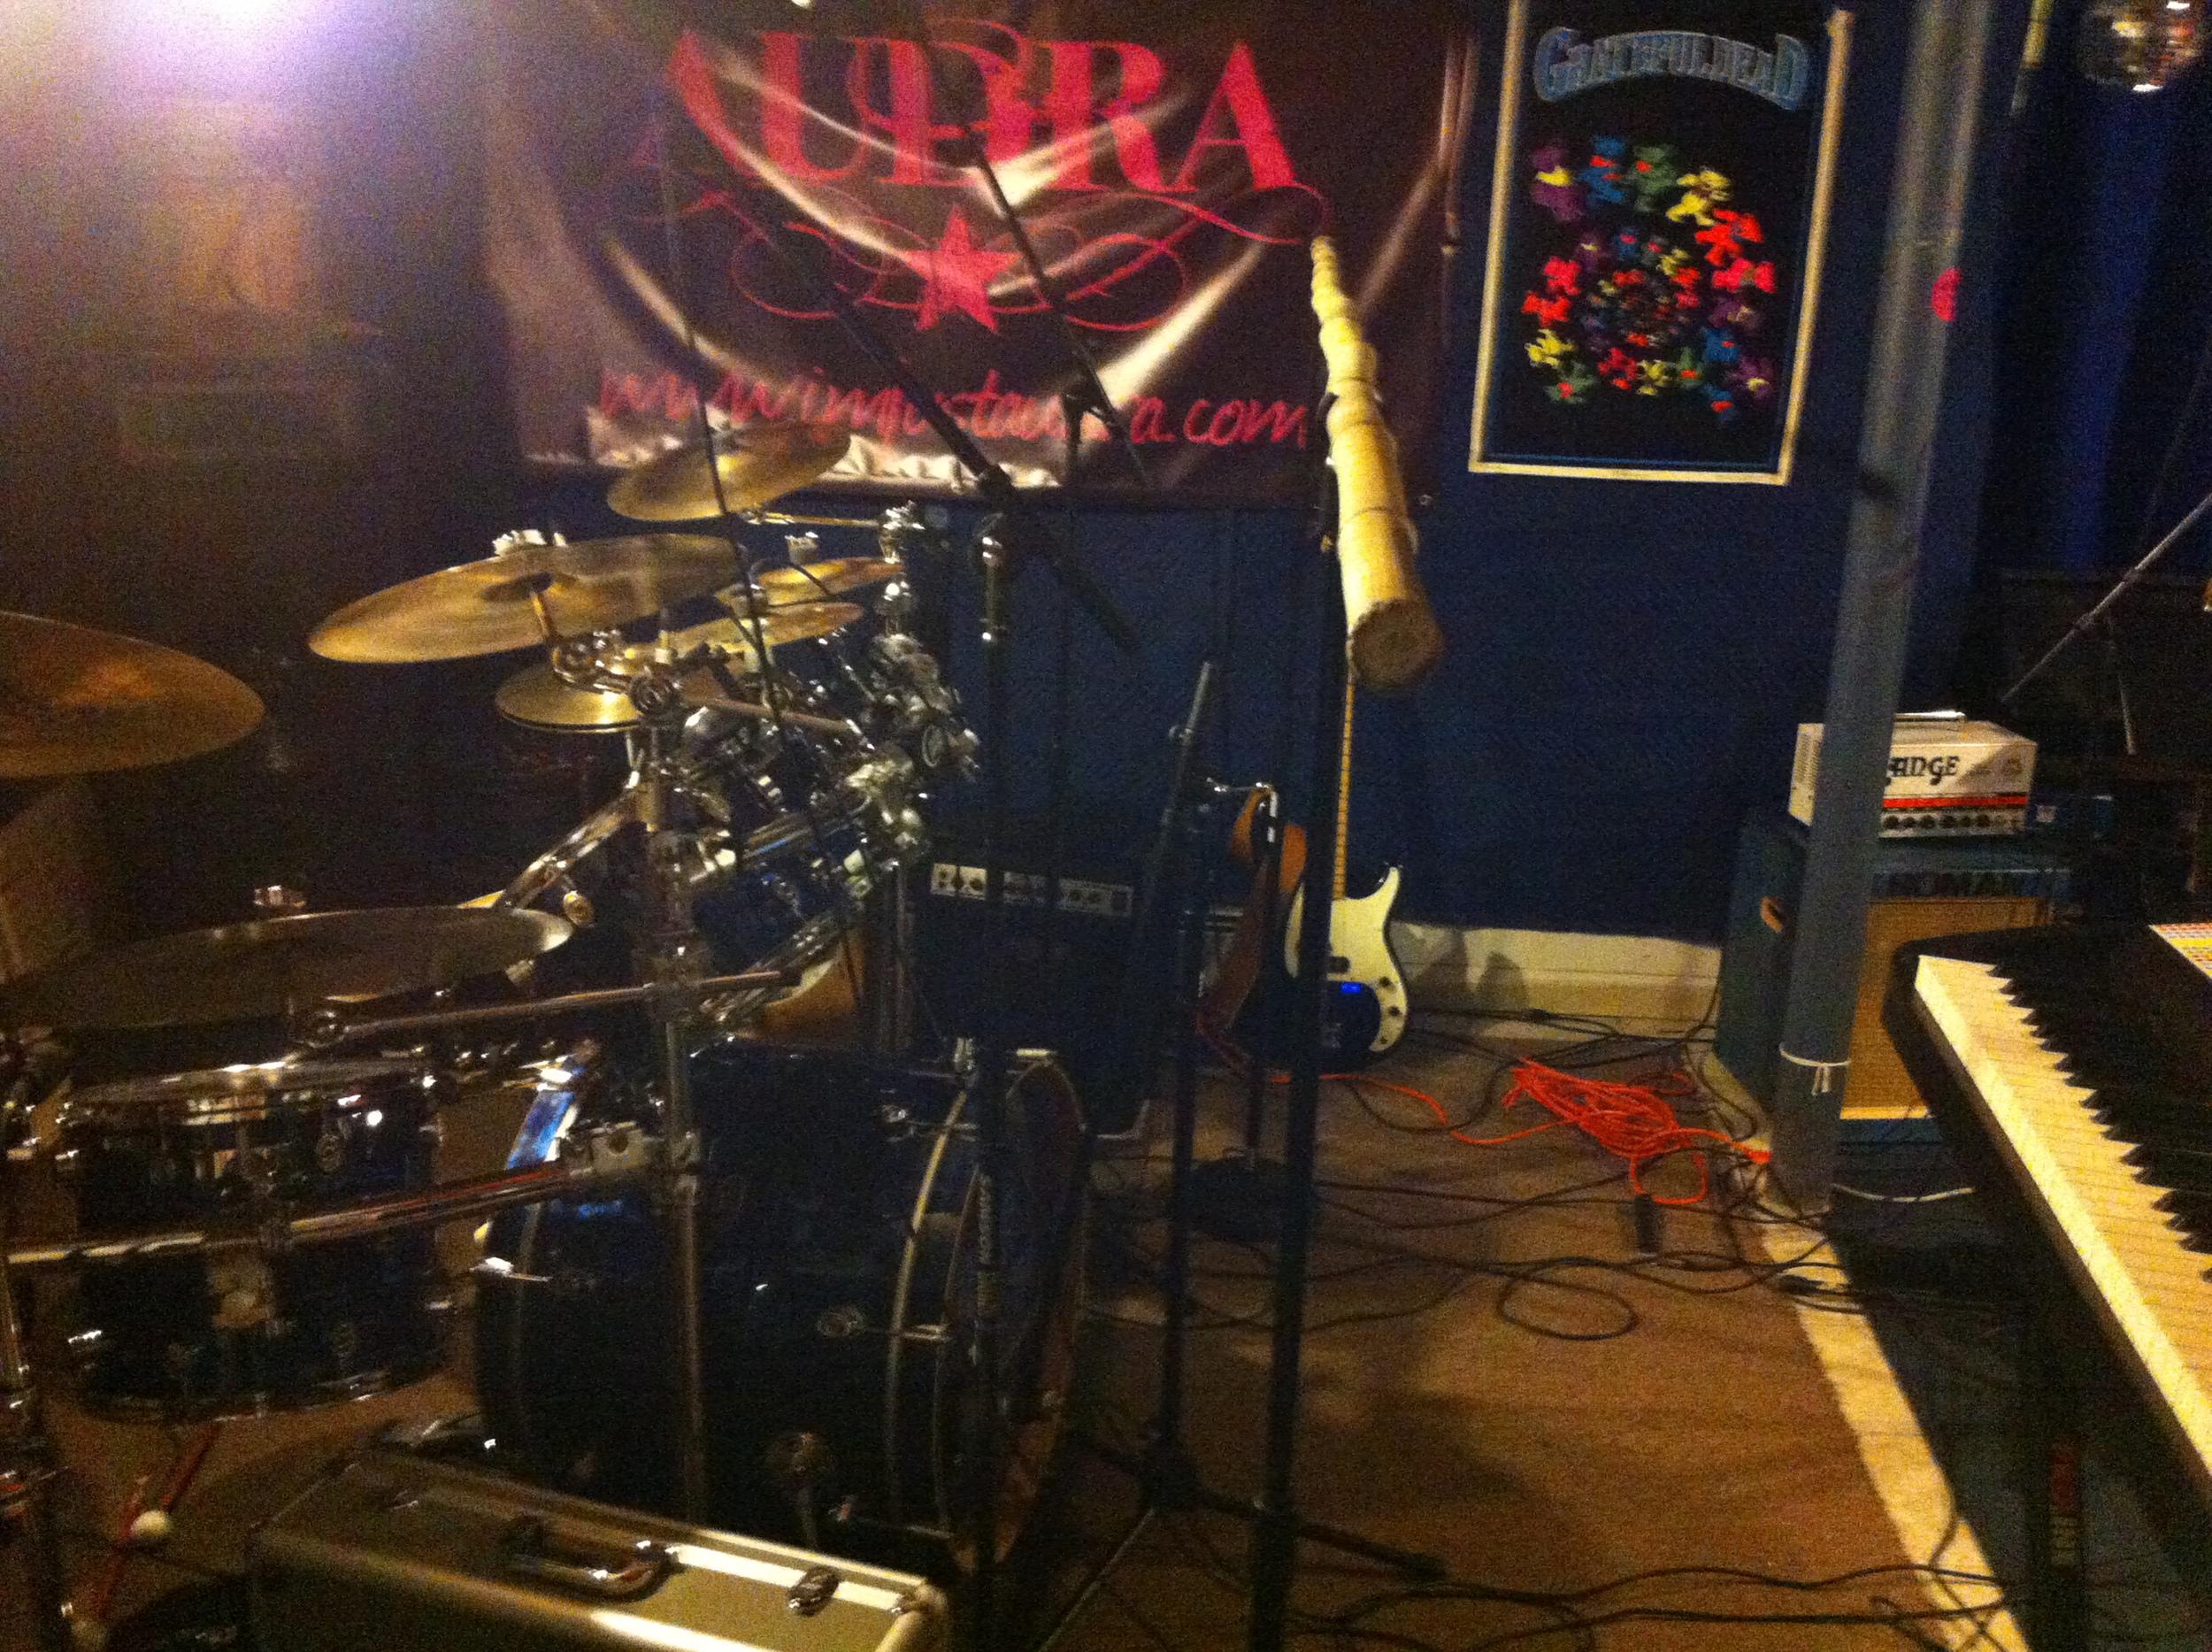 More of Pete's drum mics.